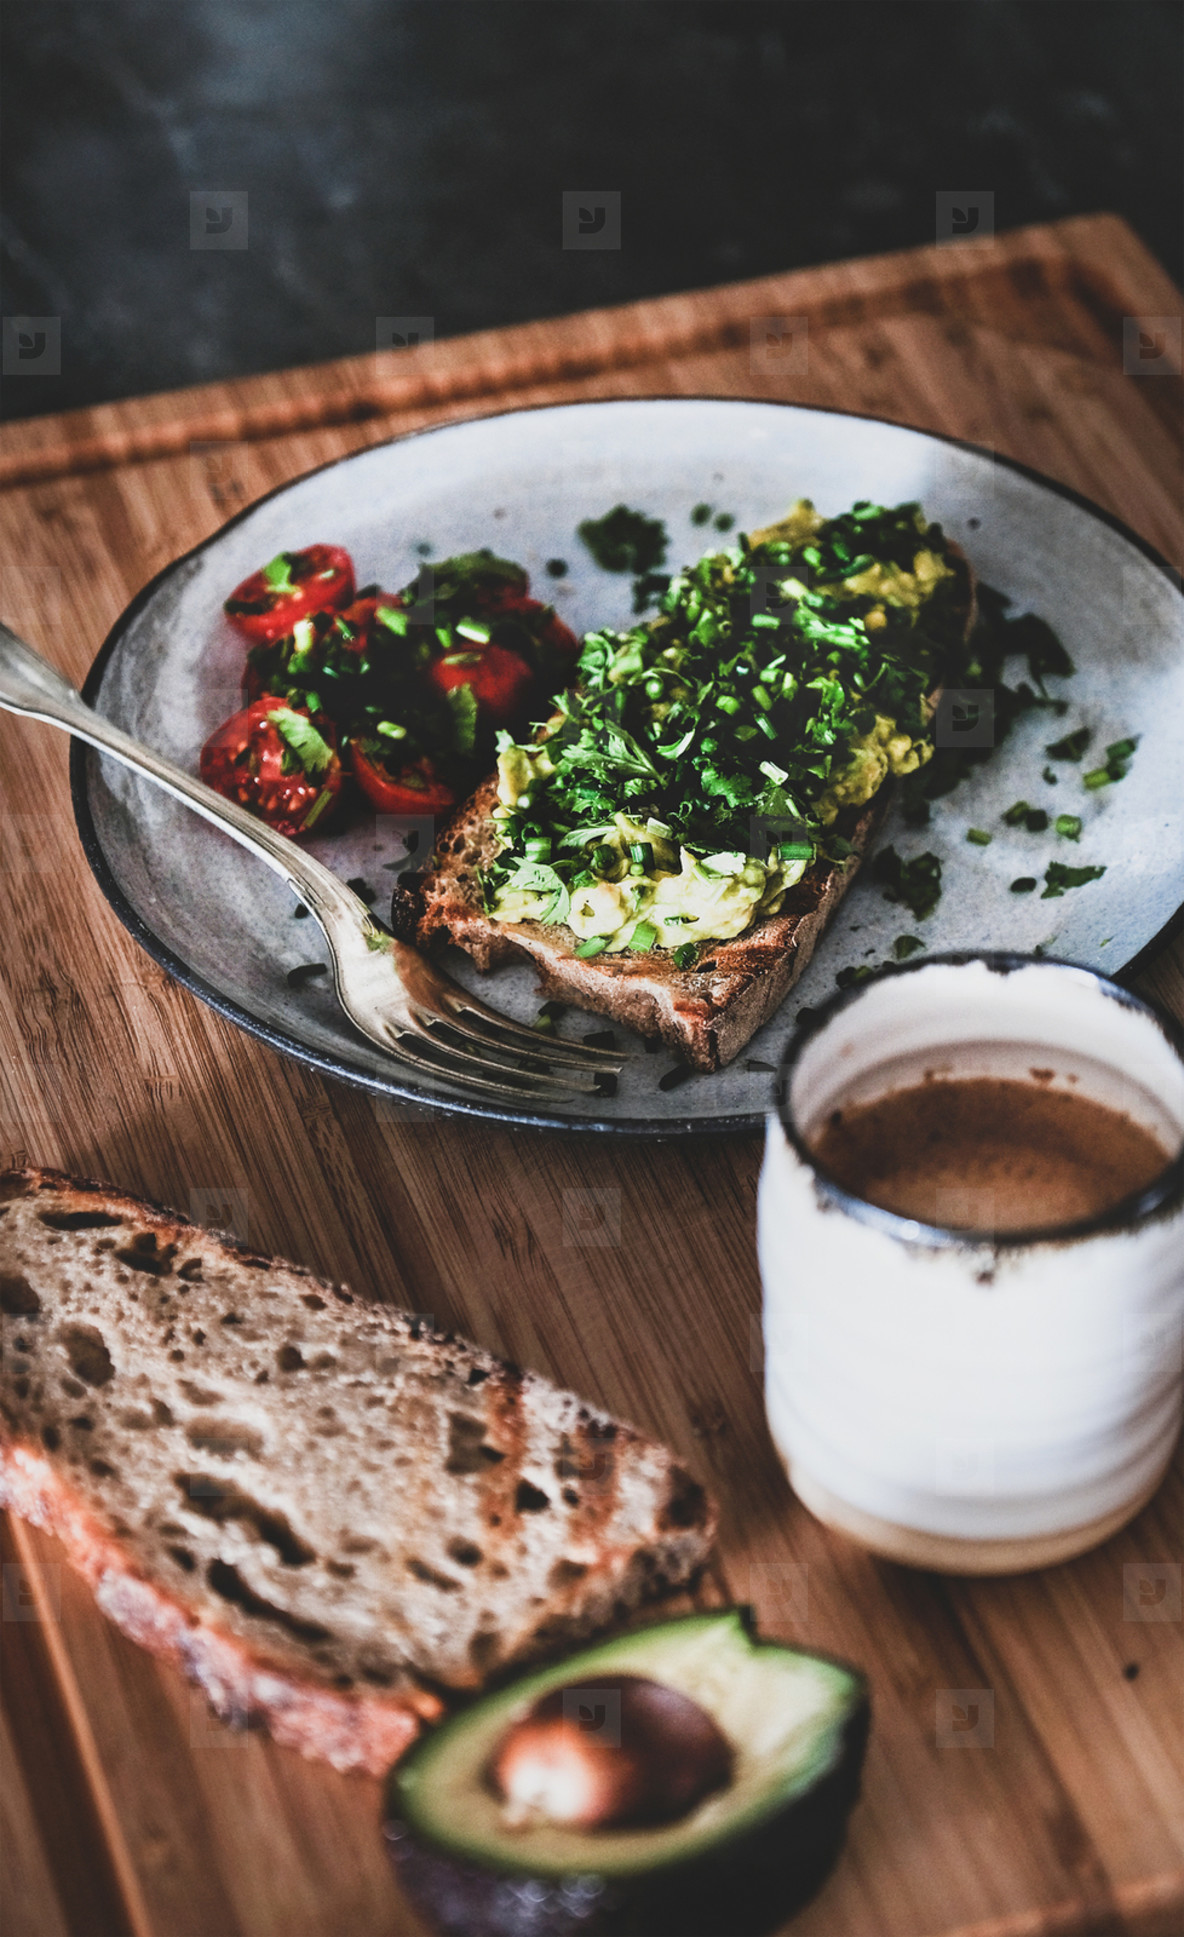 Healthy breakfast with avocado toast and espresso coffee